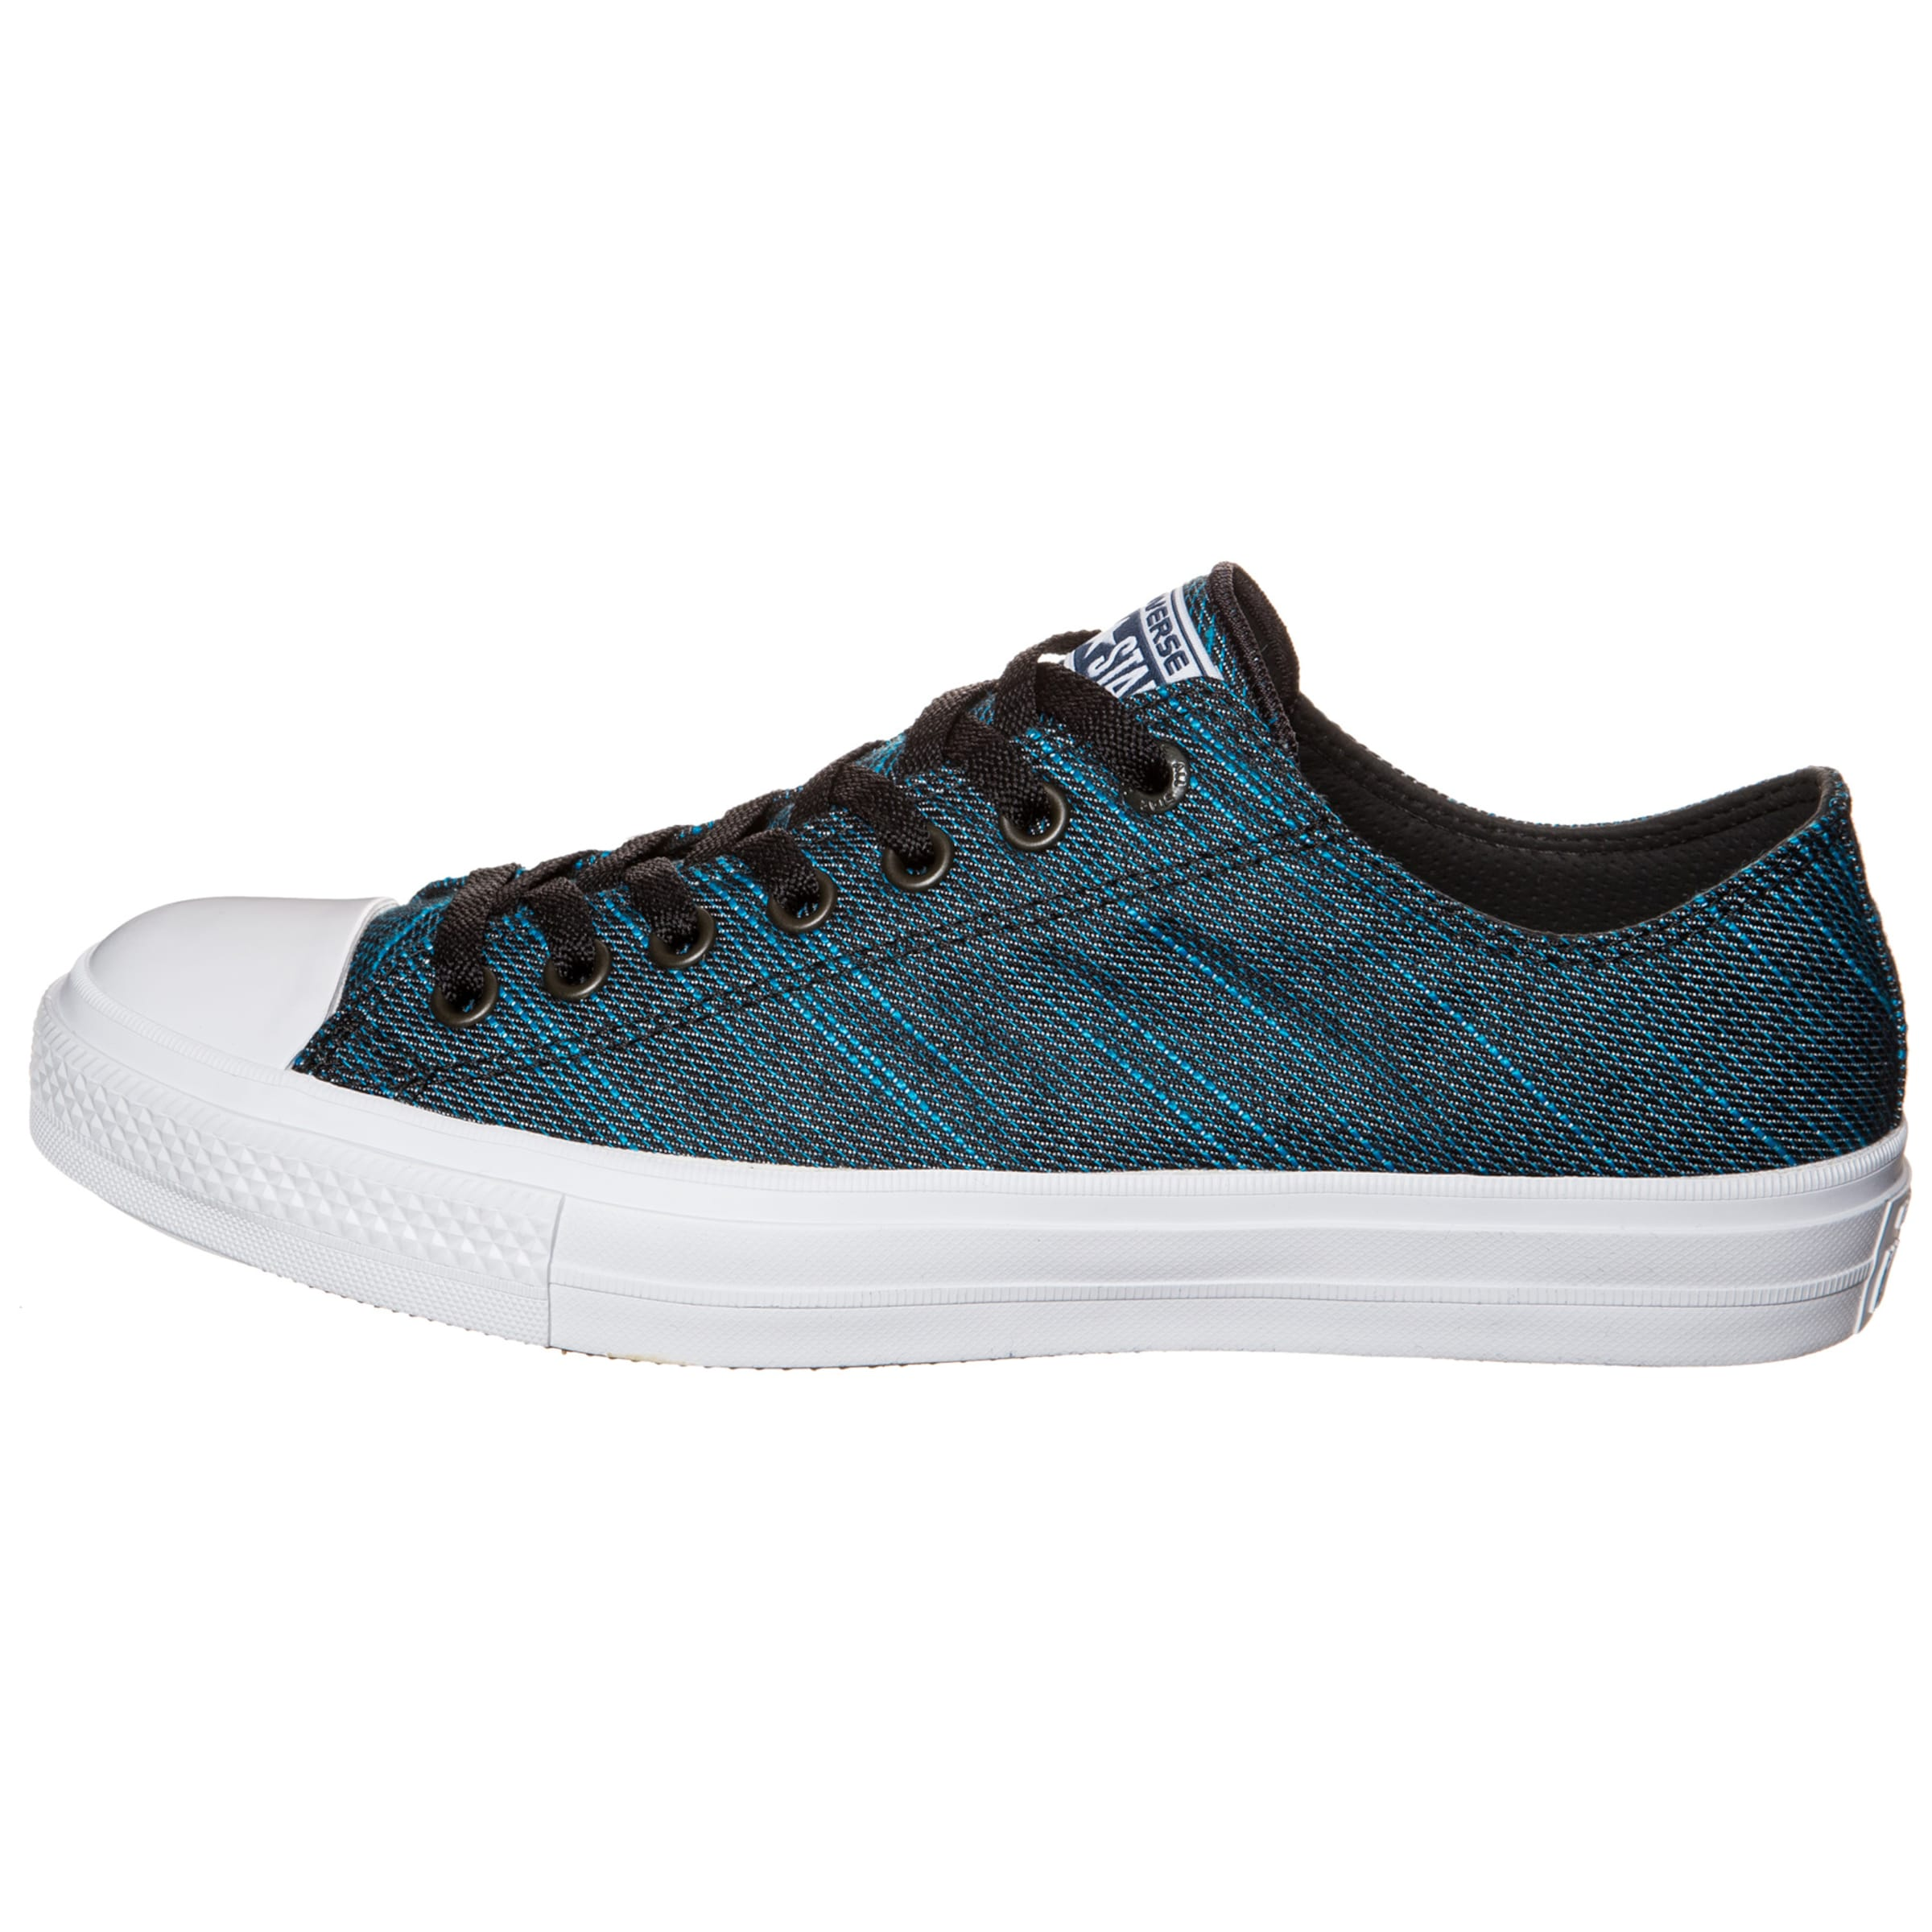 Taylor Ox In All Ii Blau Star Sneaker Chuck Converse H2eDbEW9IY